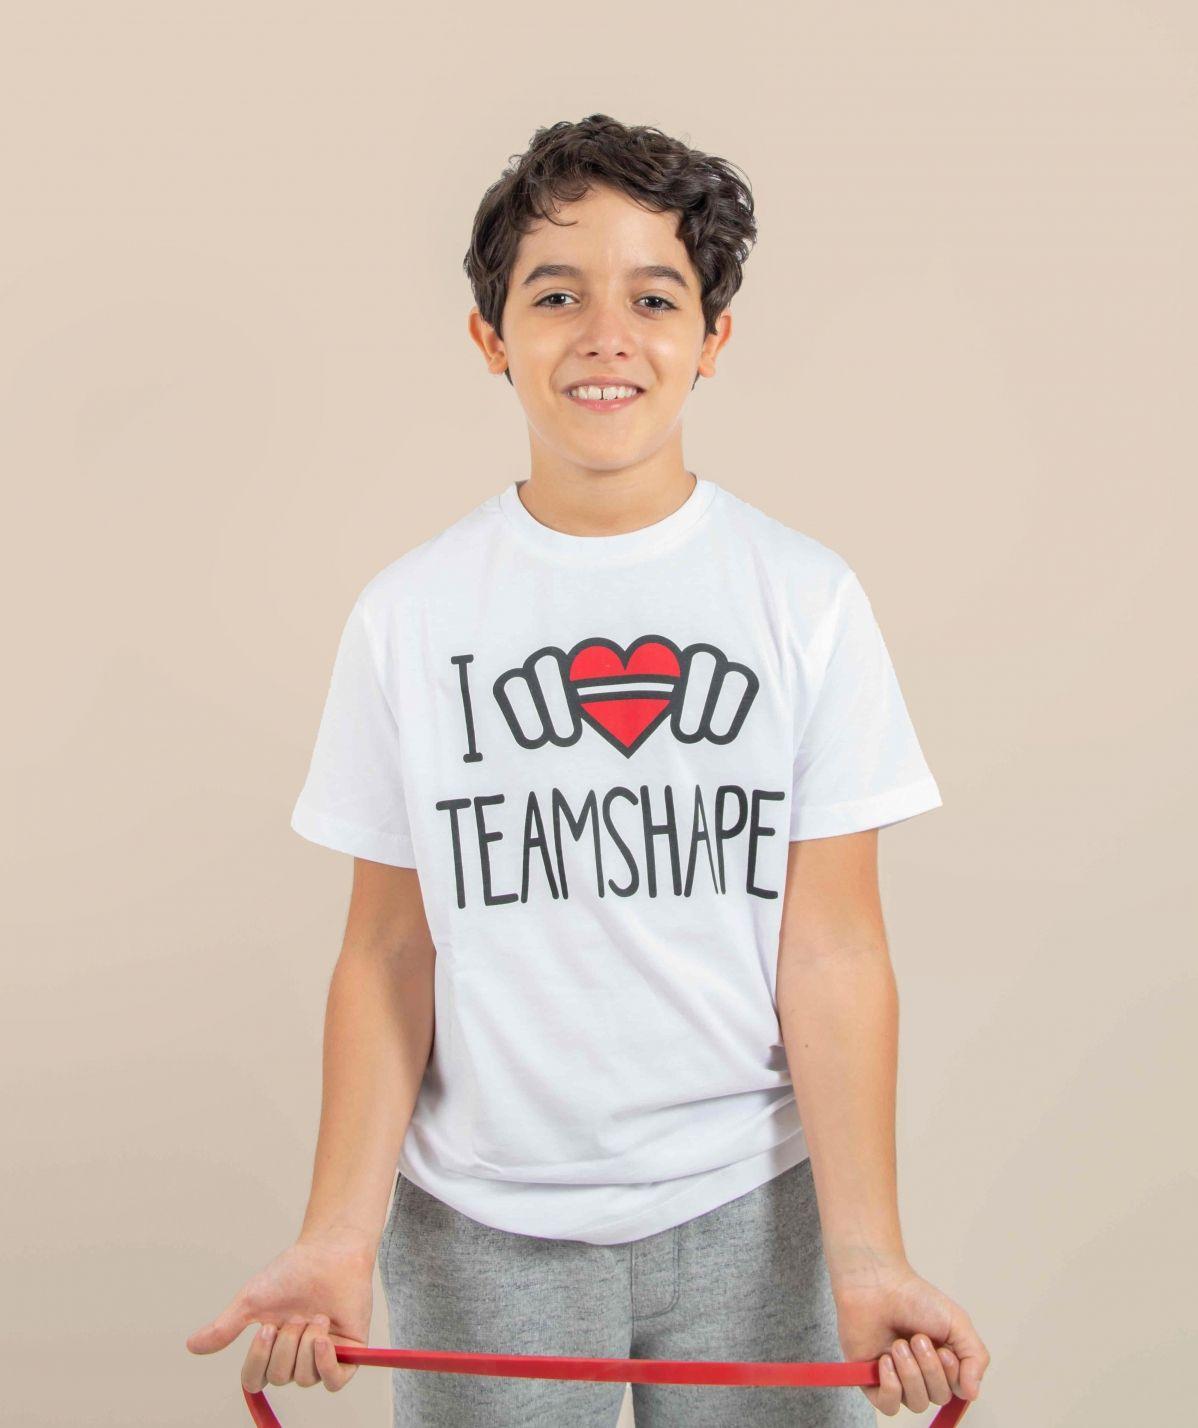 T-Shirt Bio I Love TeamShape Enfant